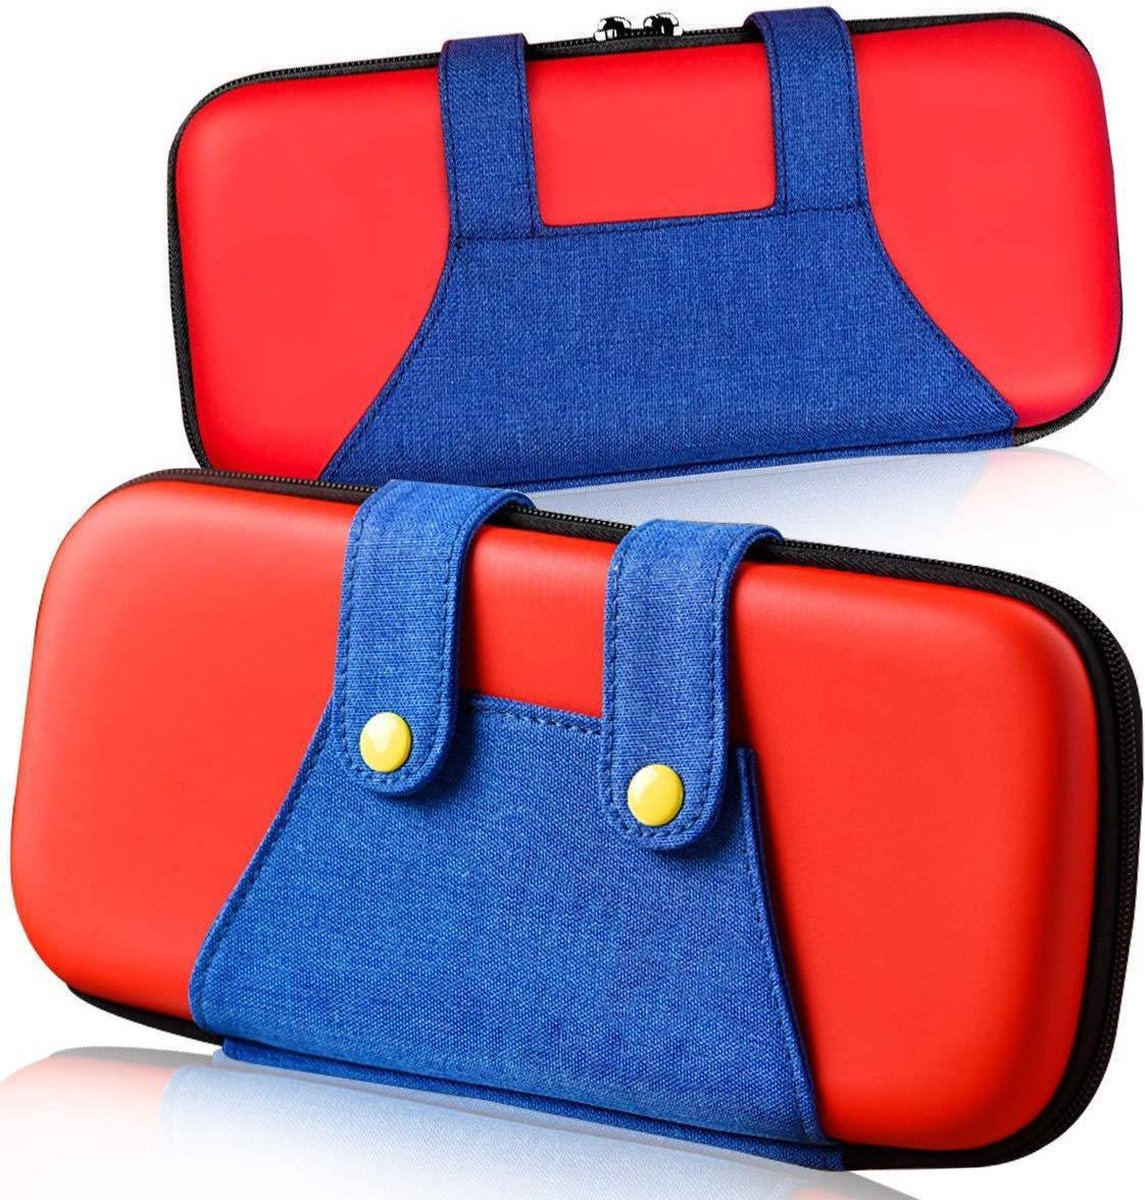 Nintendo Switch Case - Hard Case Beschermhoes - Compact - Rood - Blauw